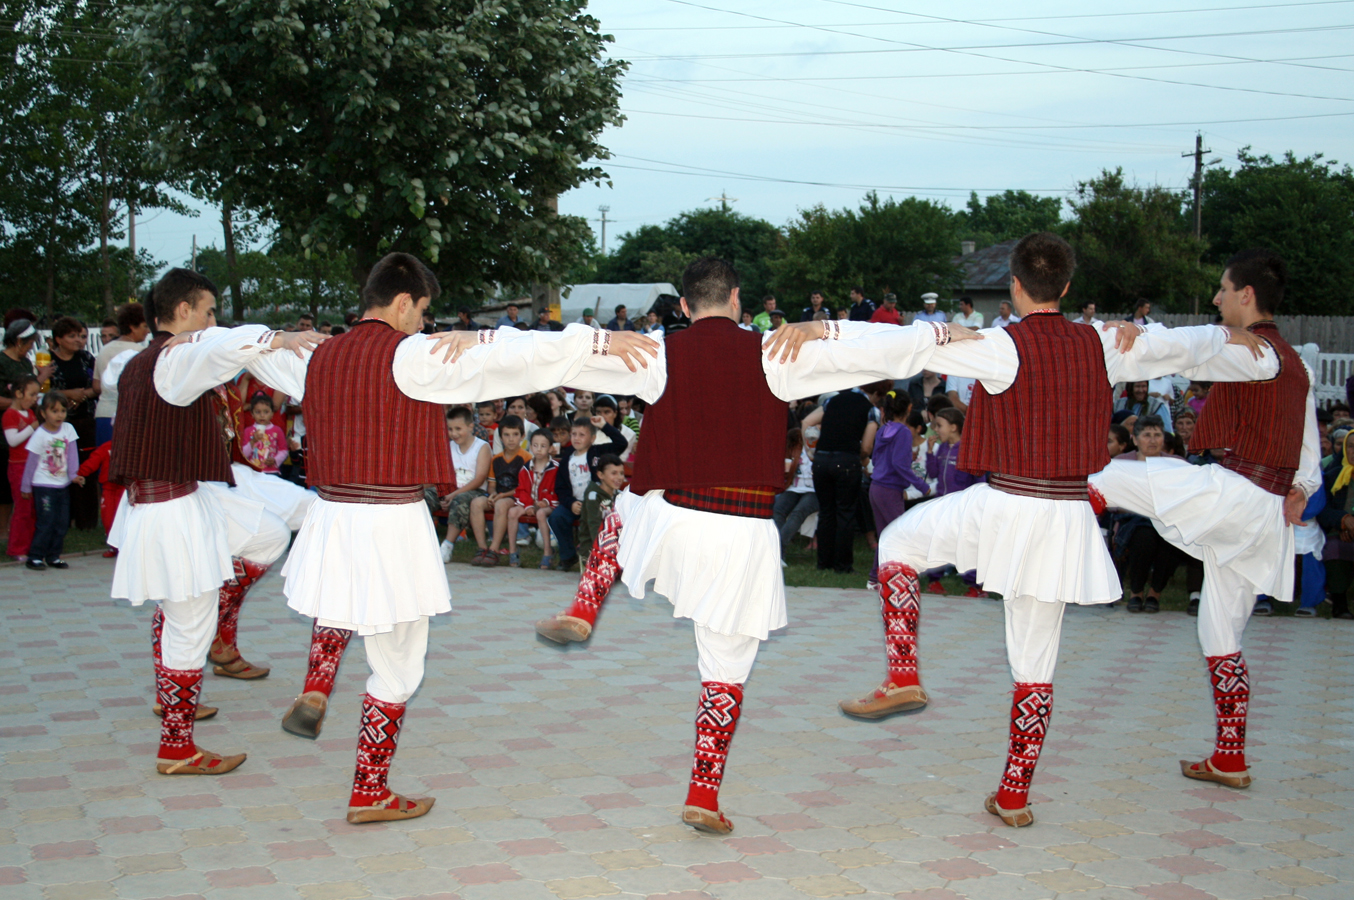 Keramicar – Macedonia